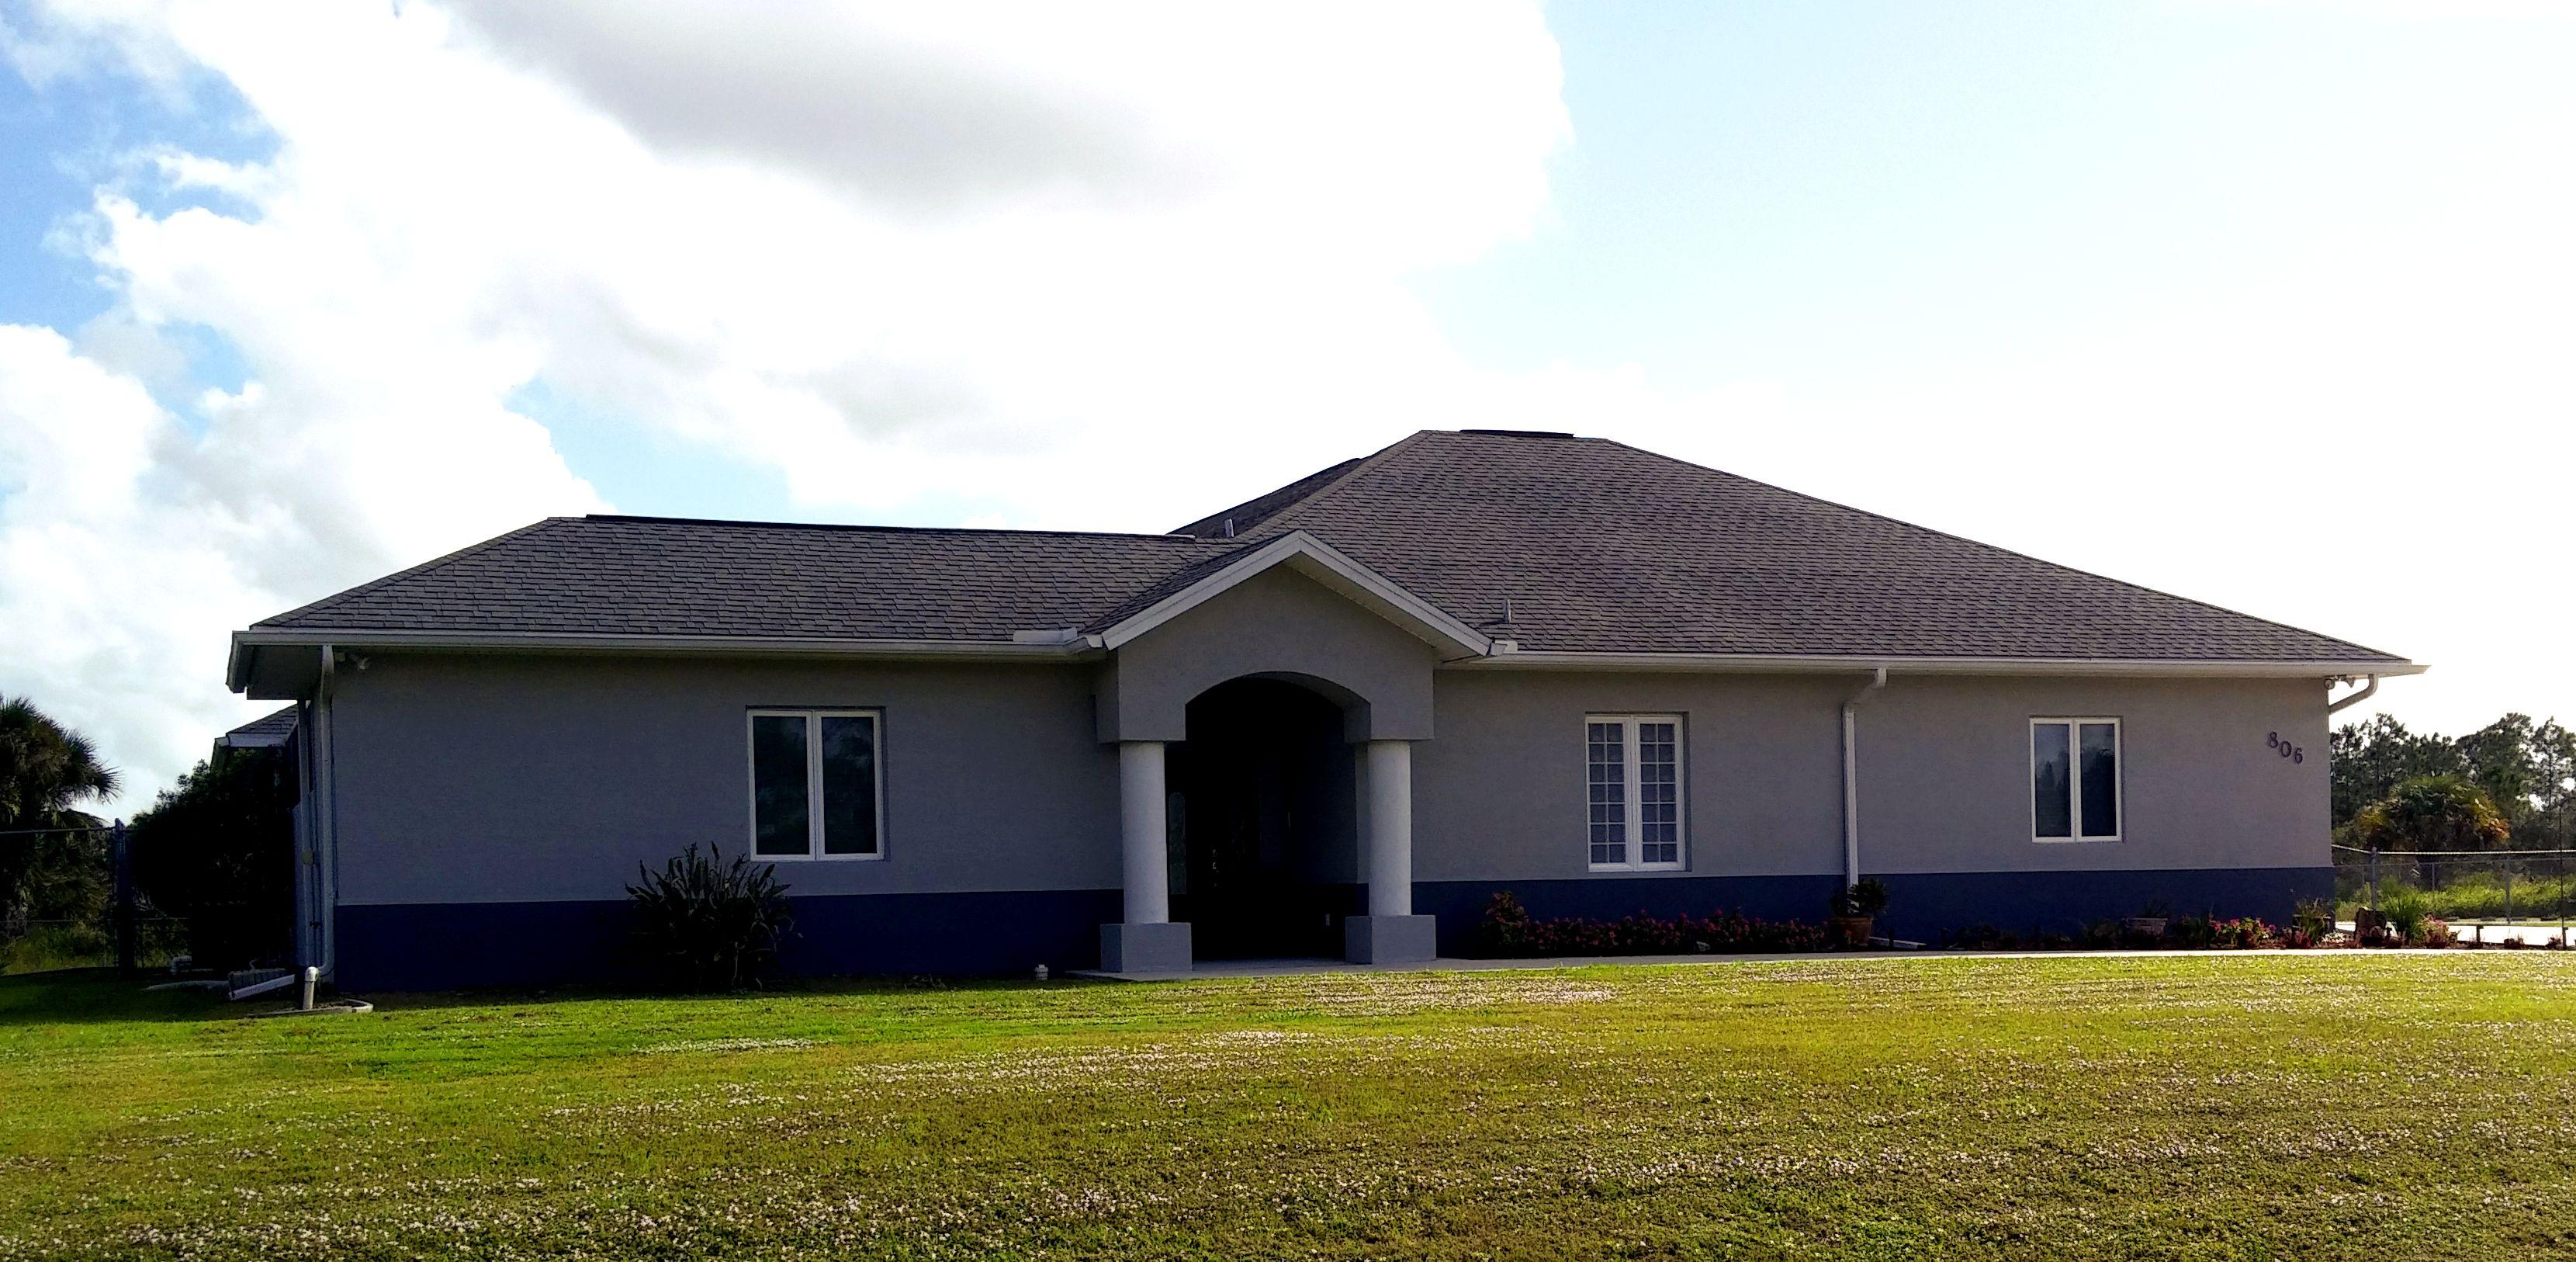 806 Cortez, Lehigh Acres, Florida 33936